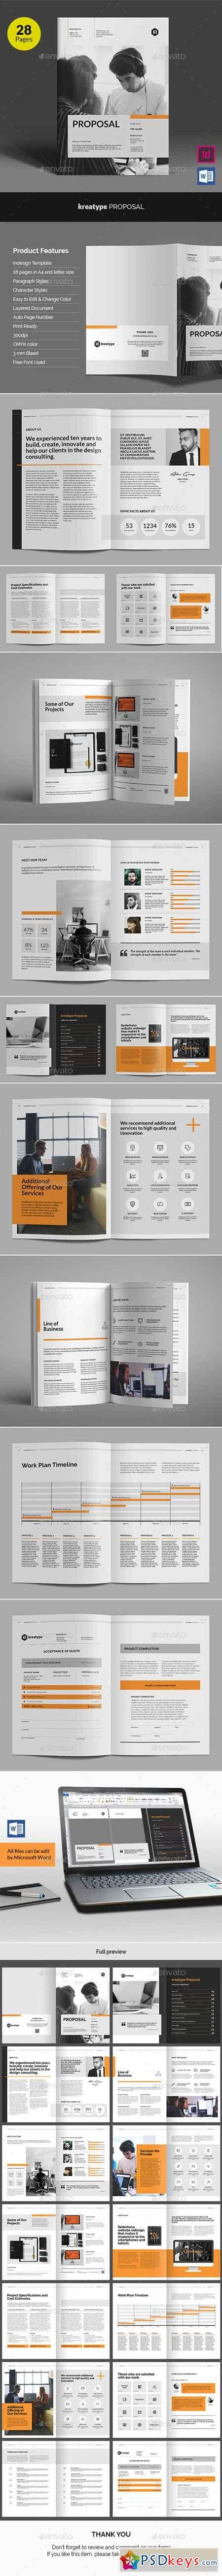 Buy Kreatype Business Proposal by heriwibowo on